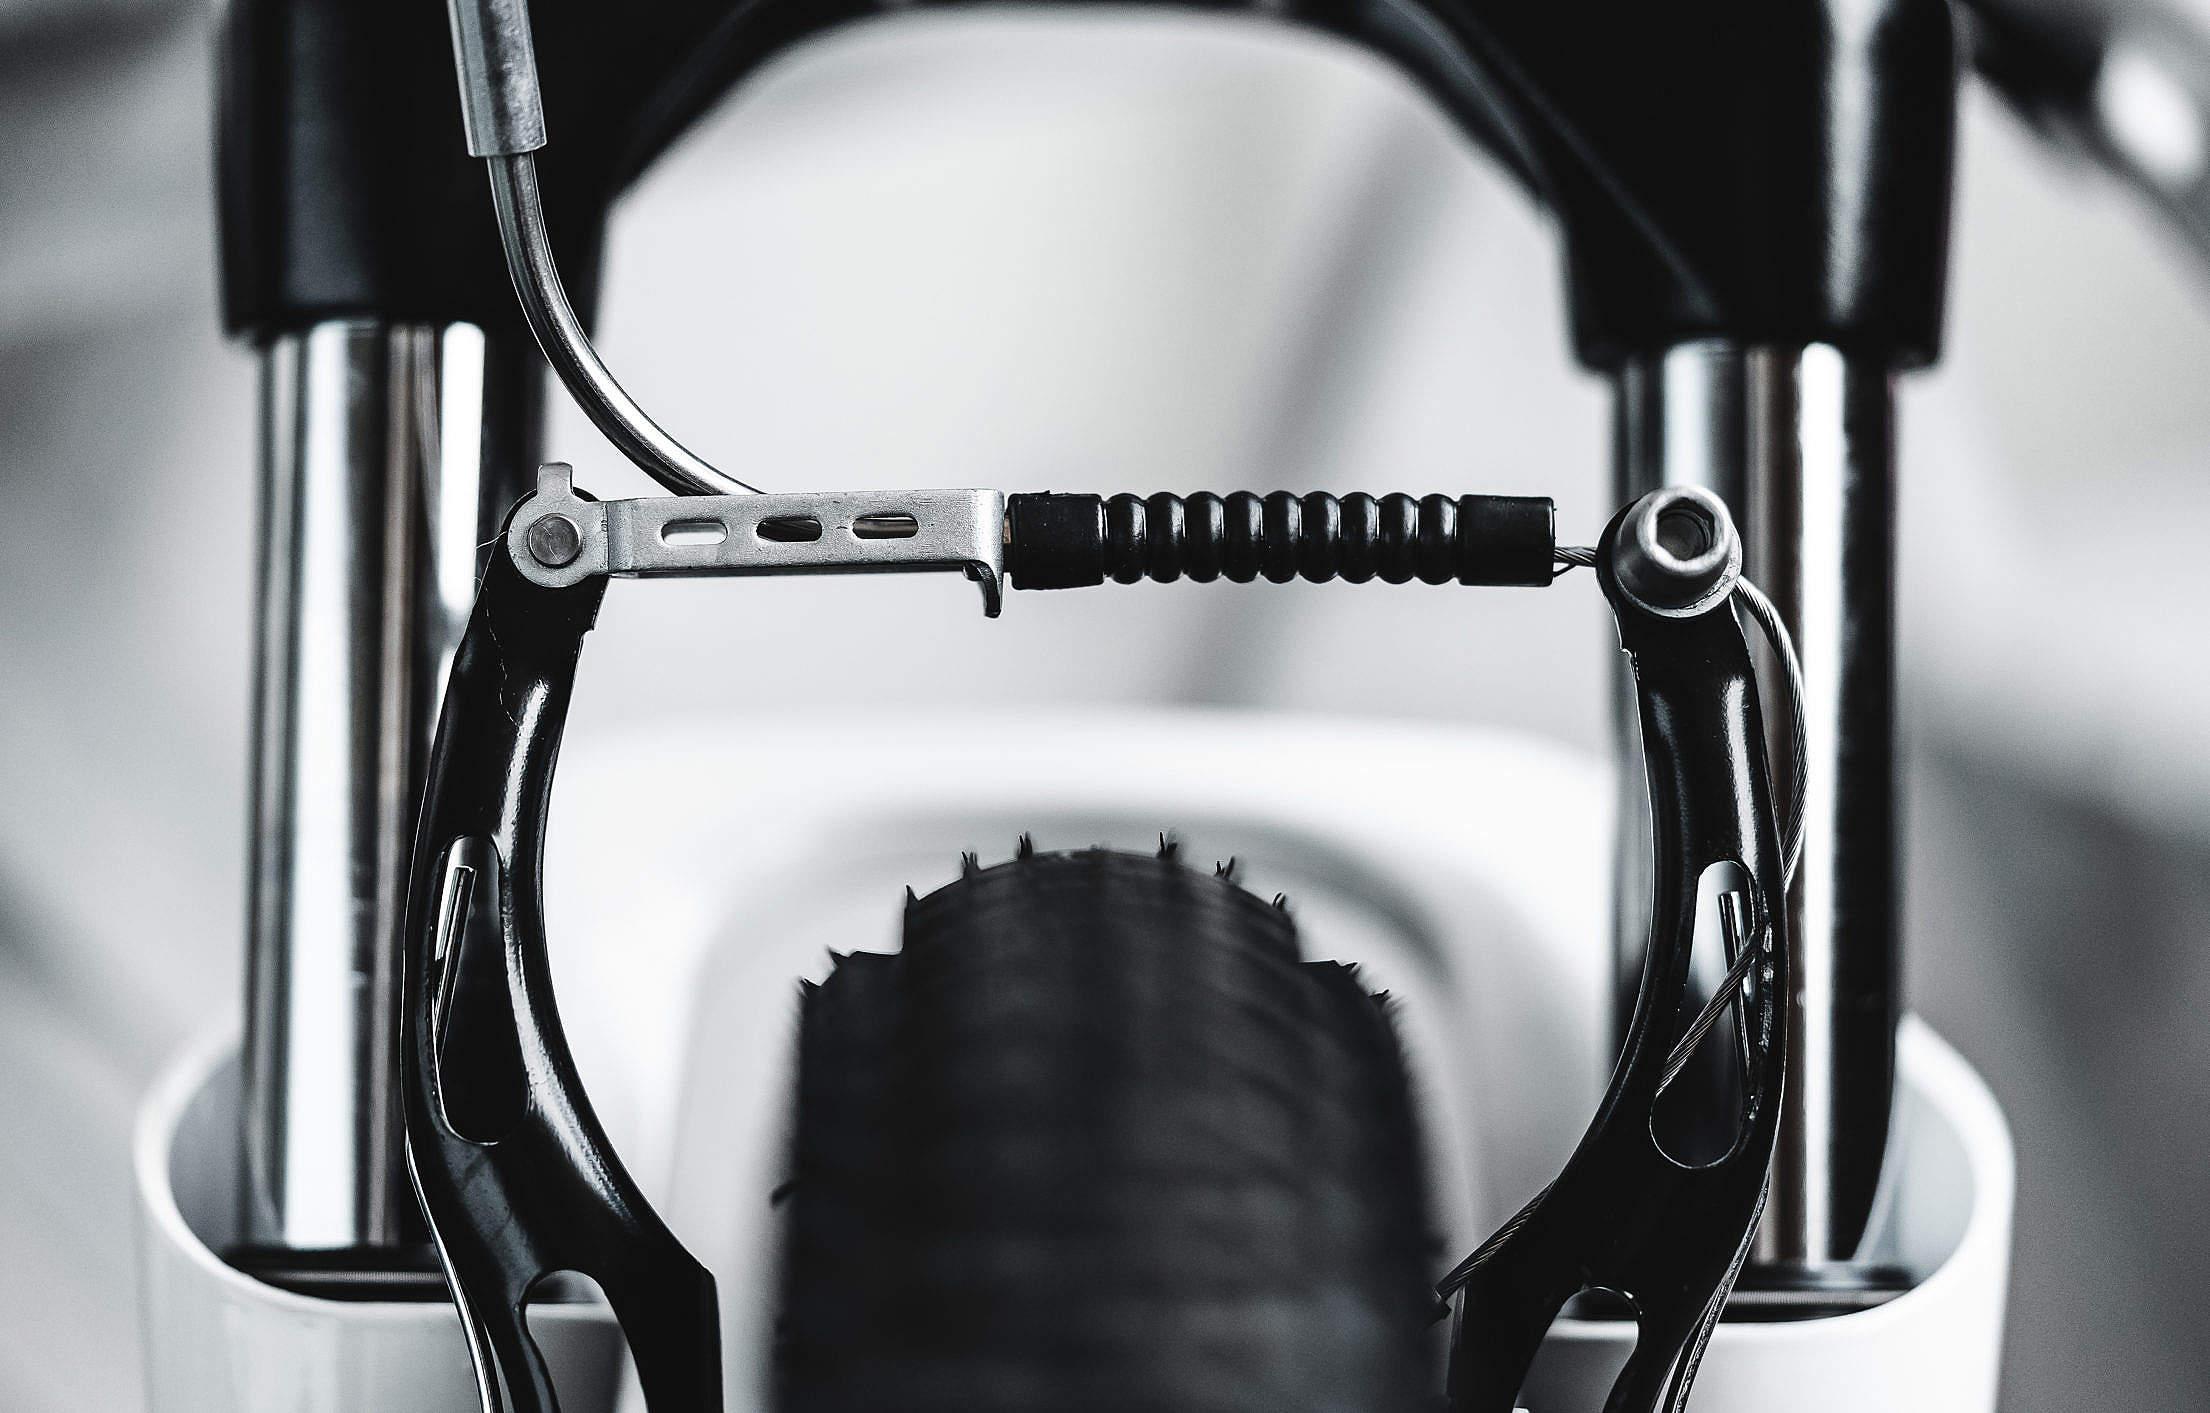 Bicycle Brakes Free Stock Photo